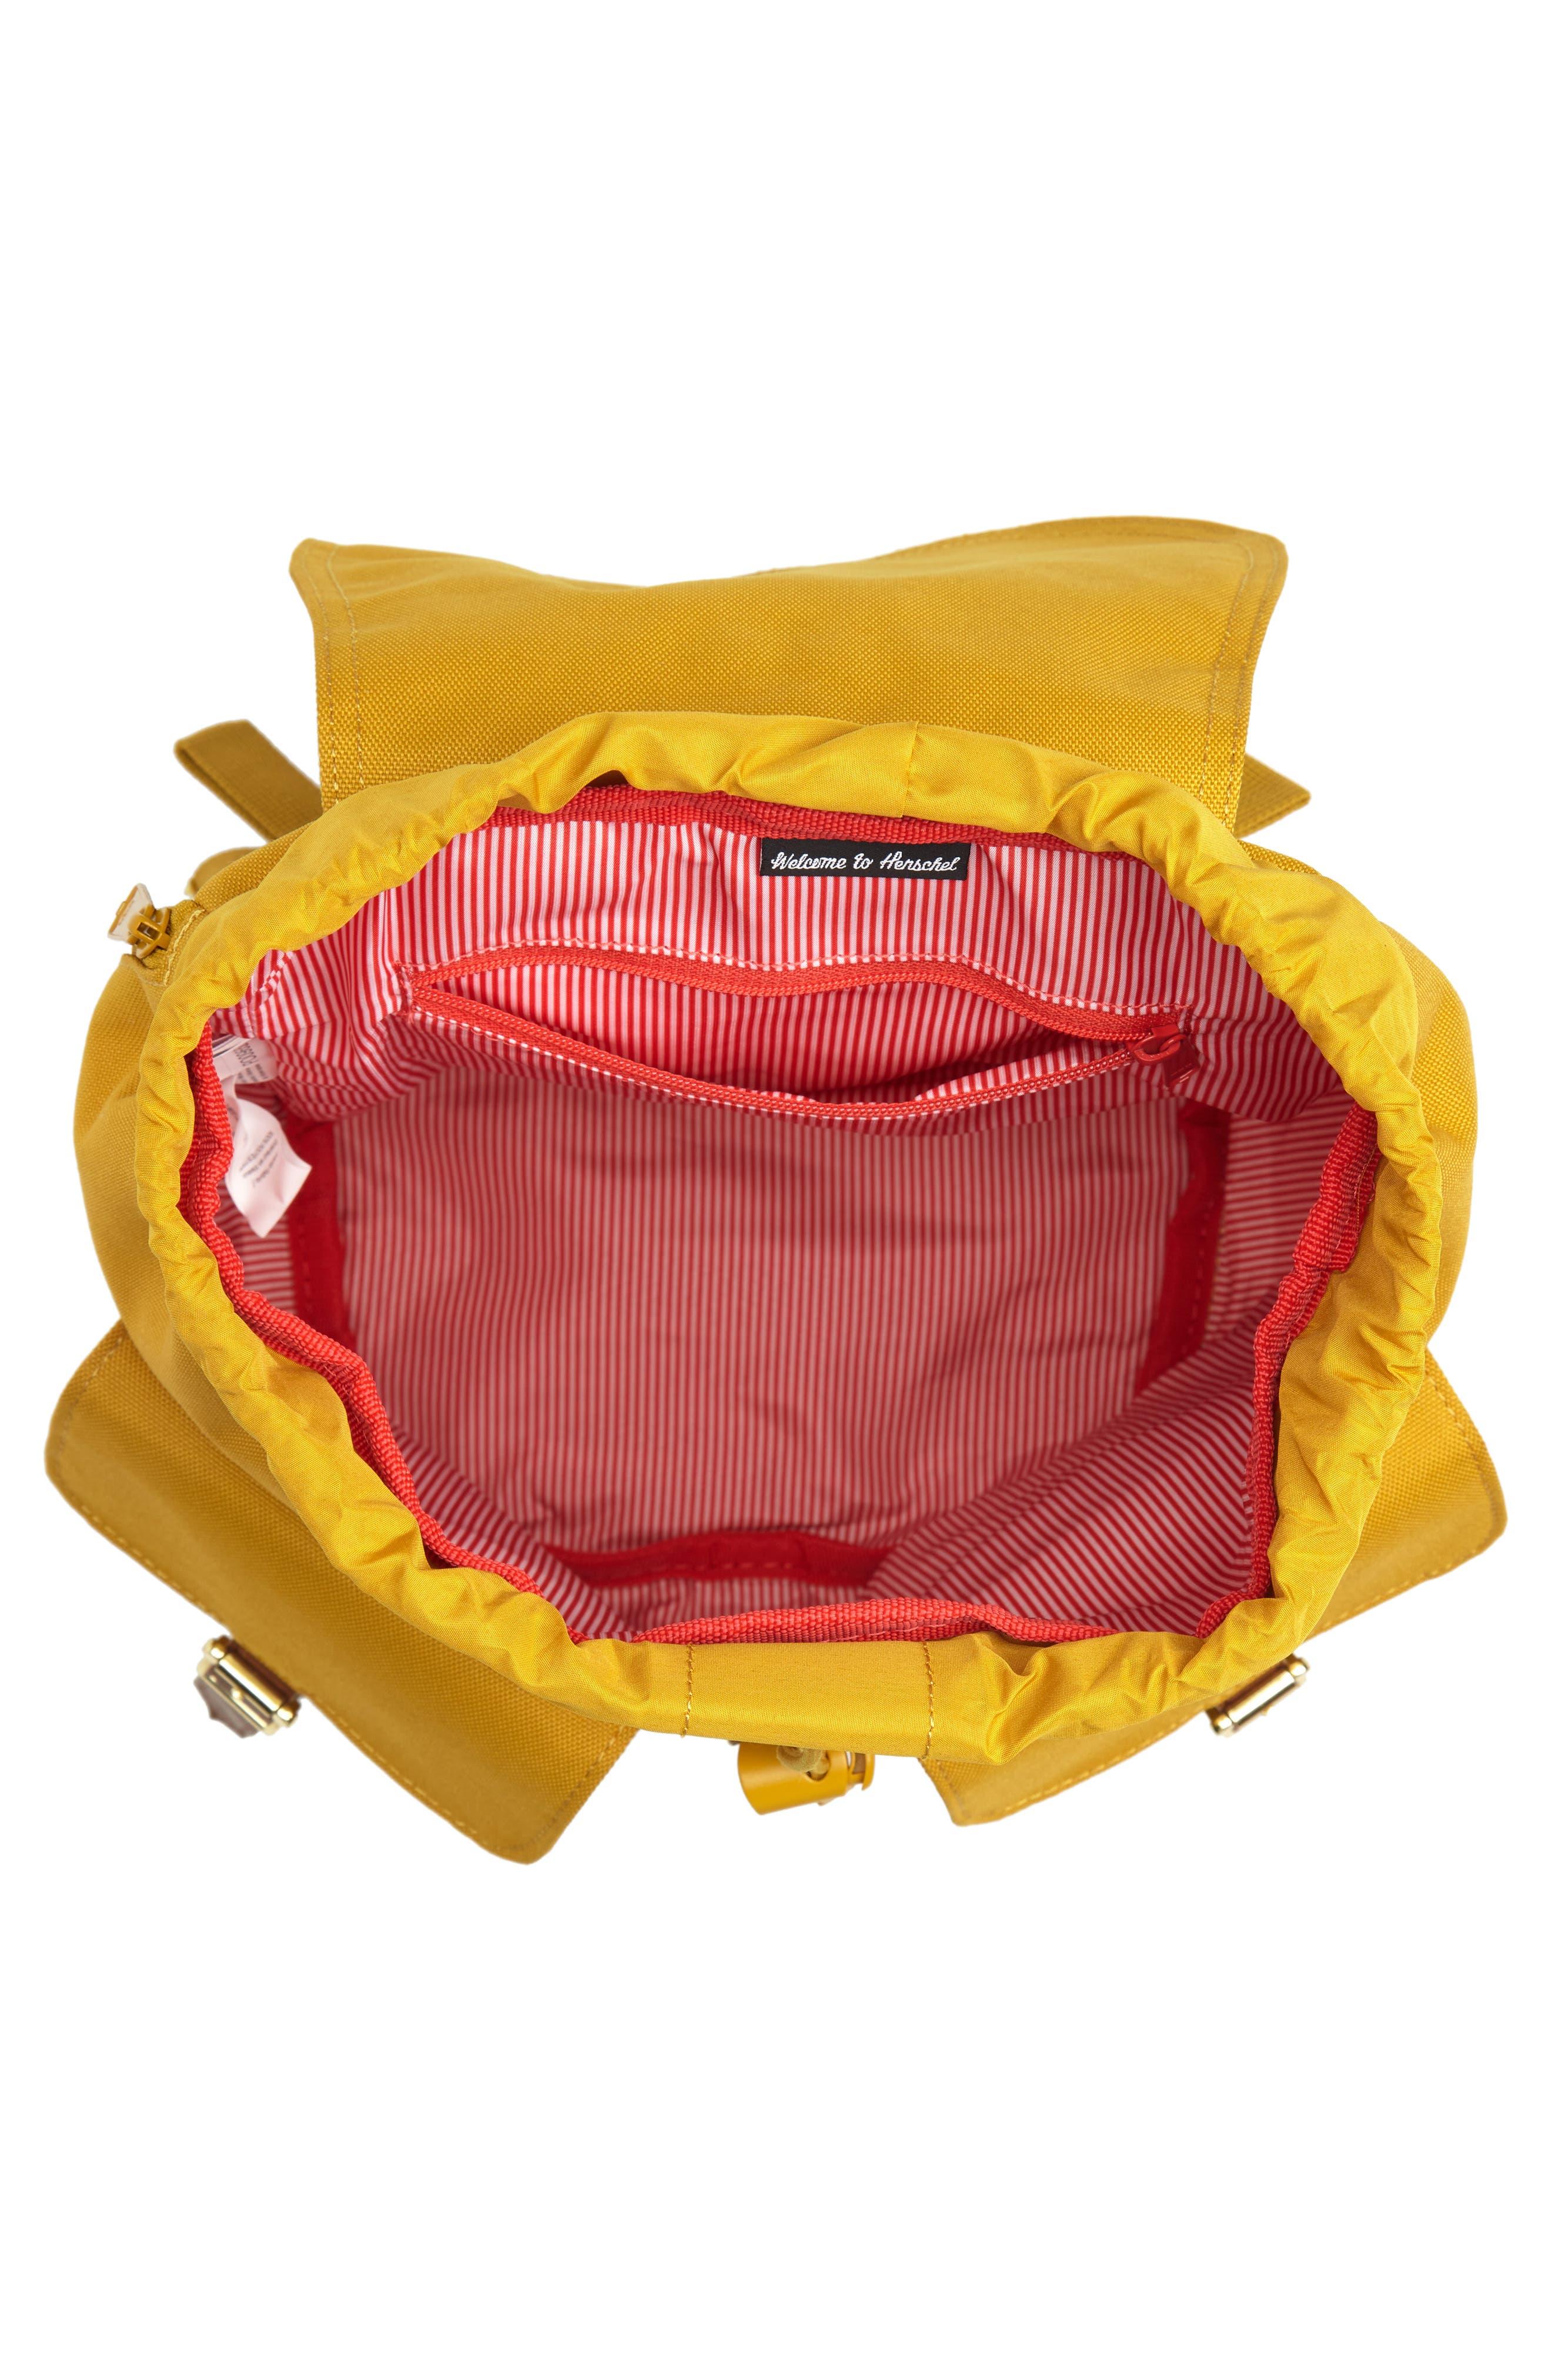 X-Small Dawson Backpack,                             Alternate thumbnail 4, color,                             ARROWWOOD